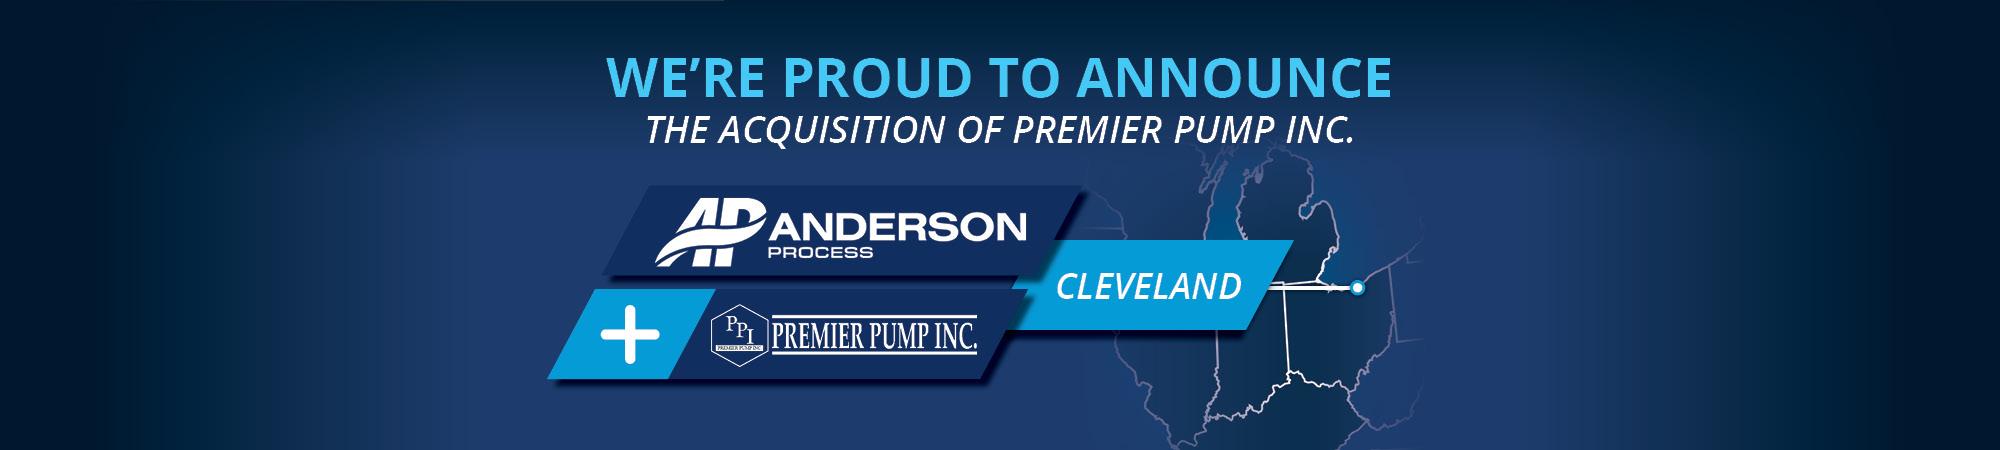 Anderson Process Acquires Premier Pump Inc.